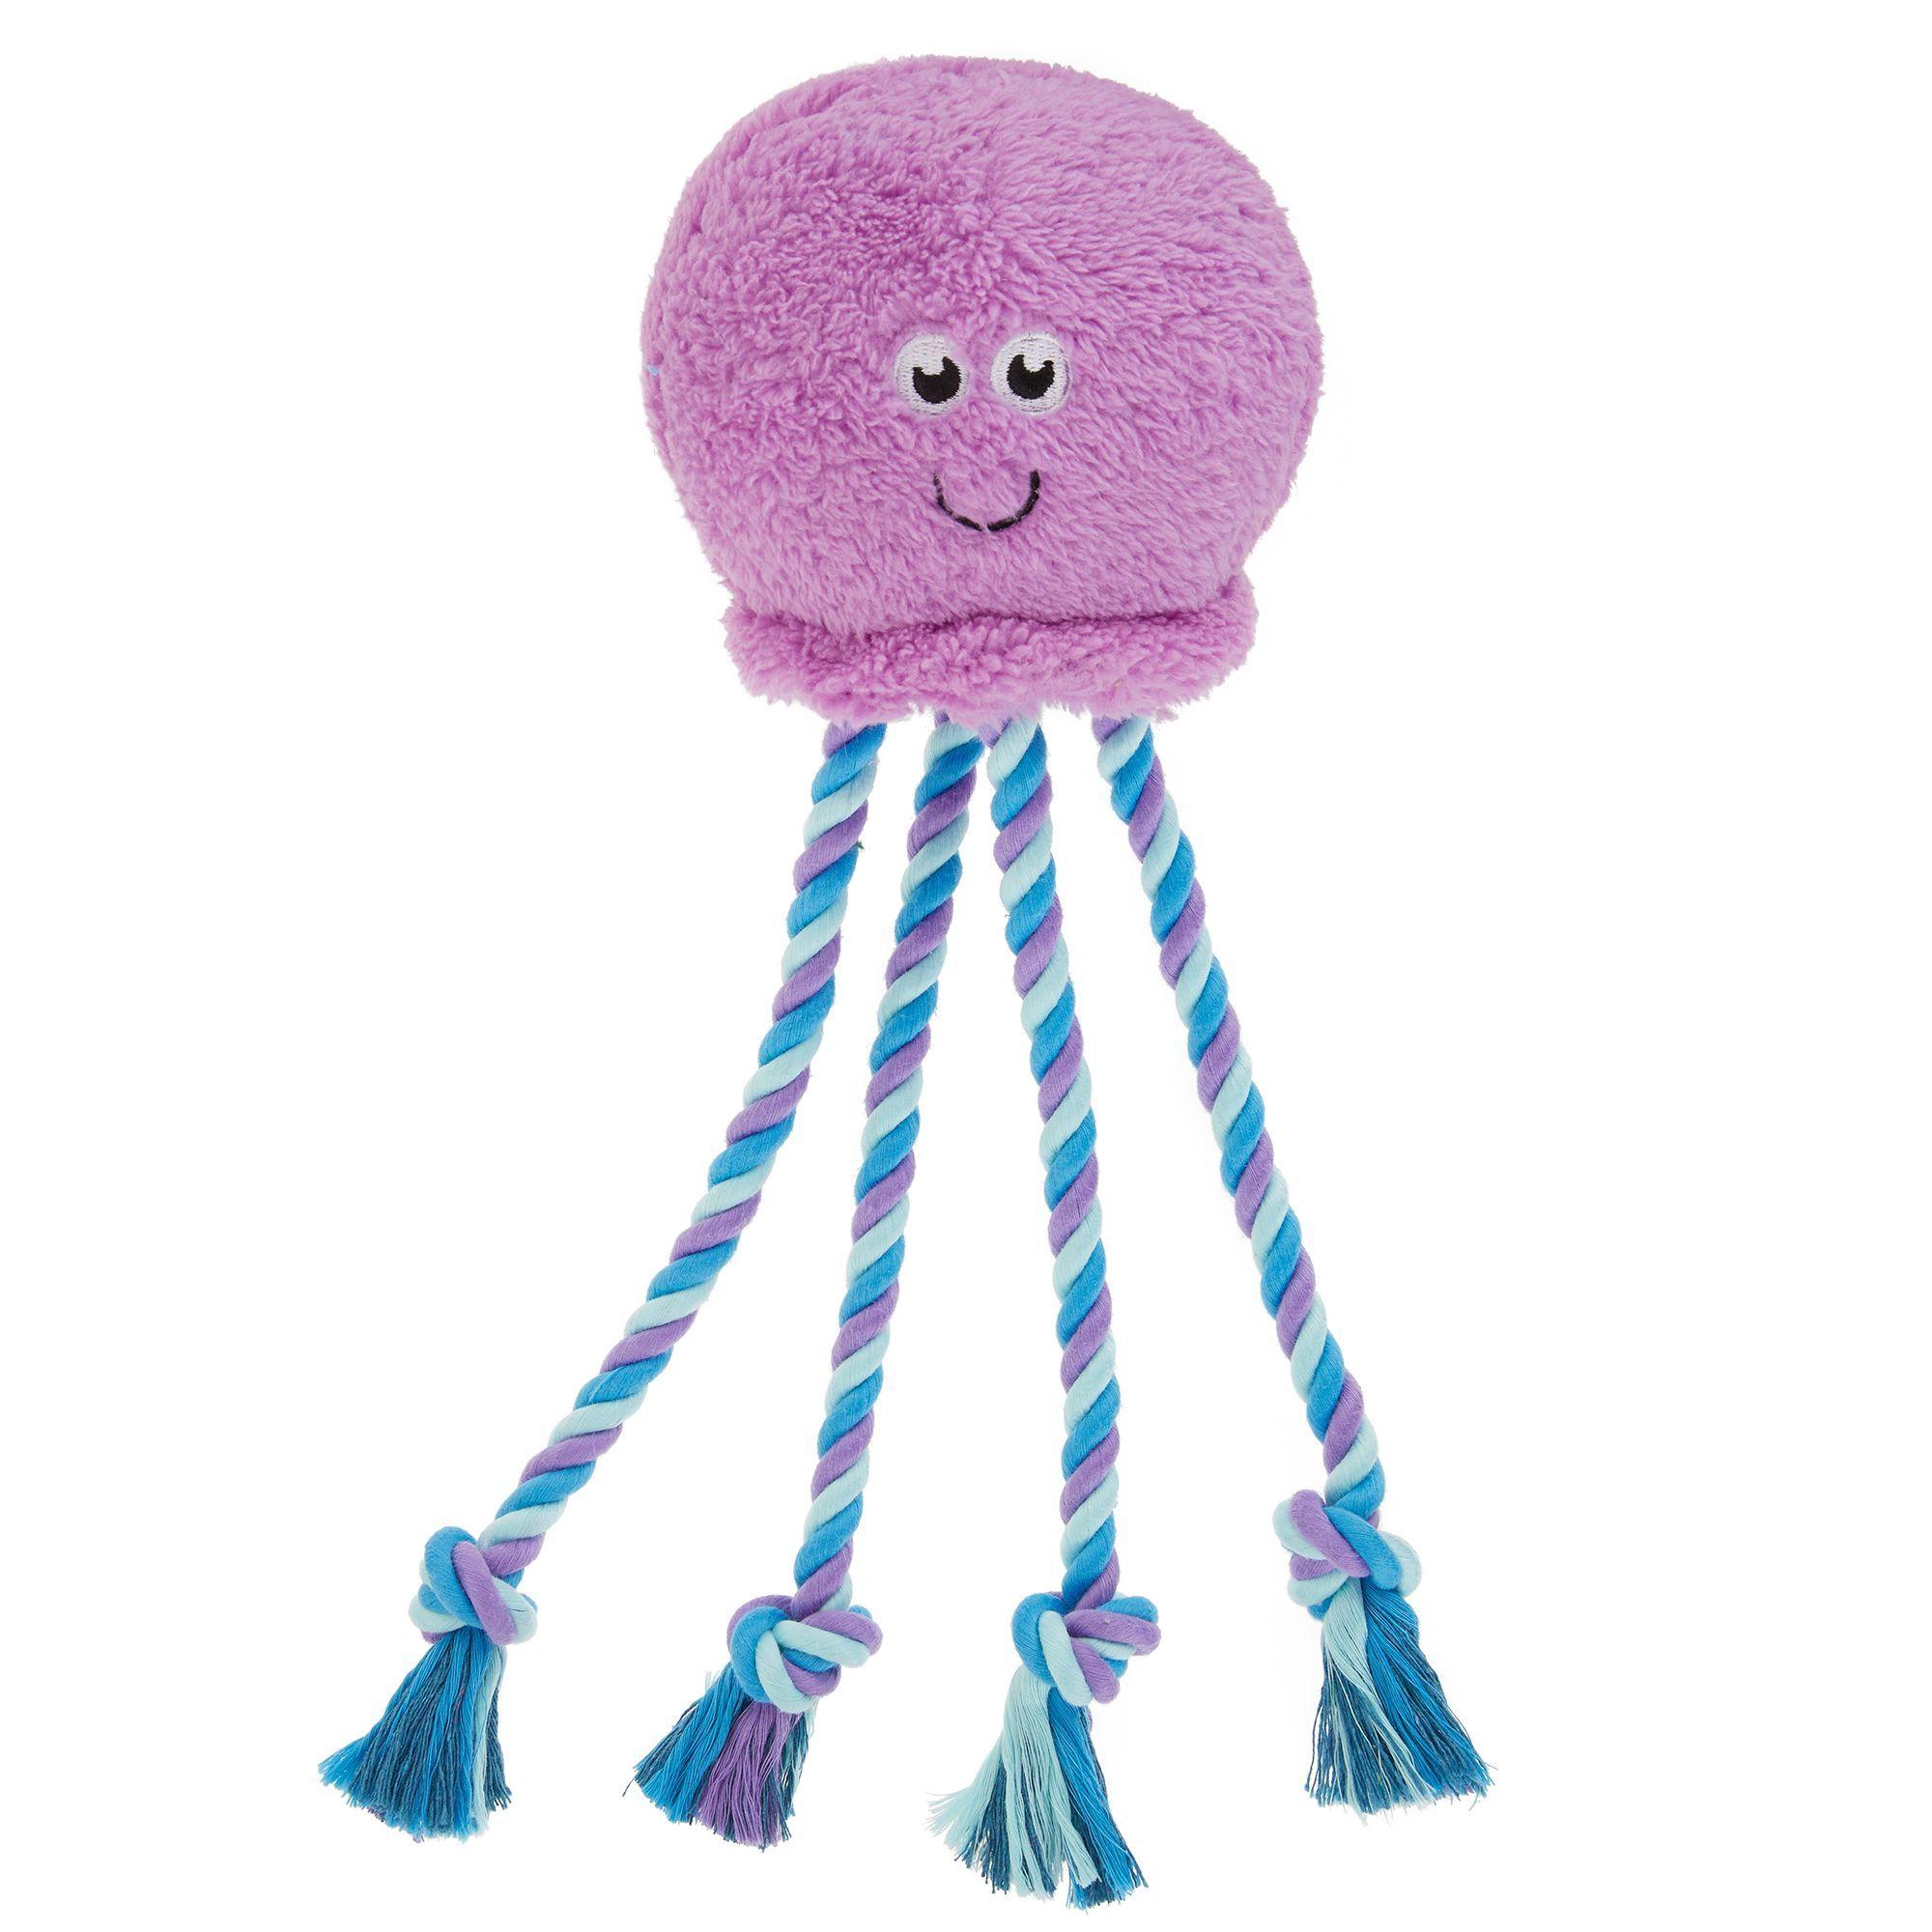 Top Paw Octopus Puppy Dog Toy Plush Rope Plush Dog Toys